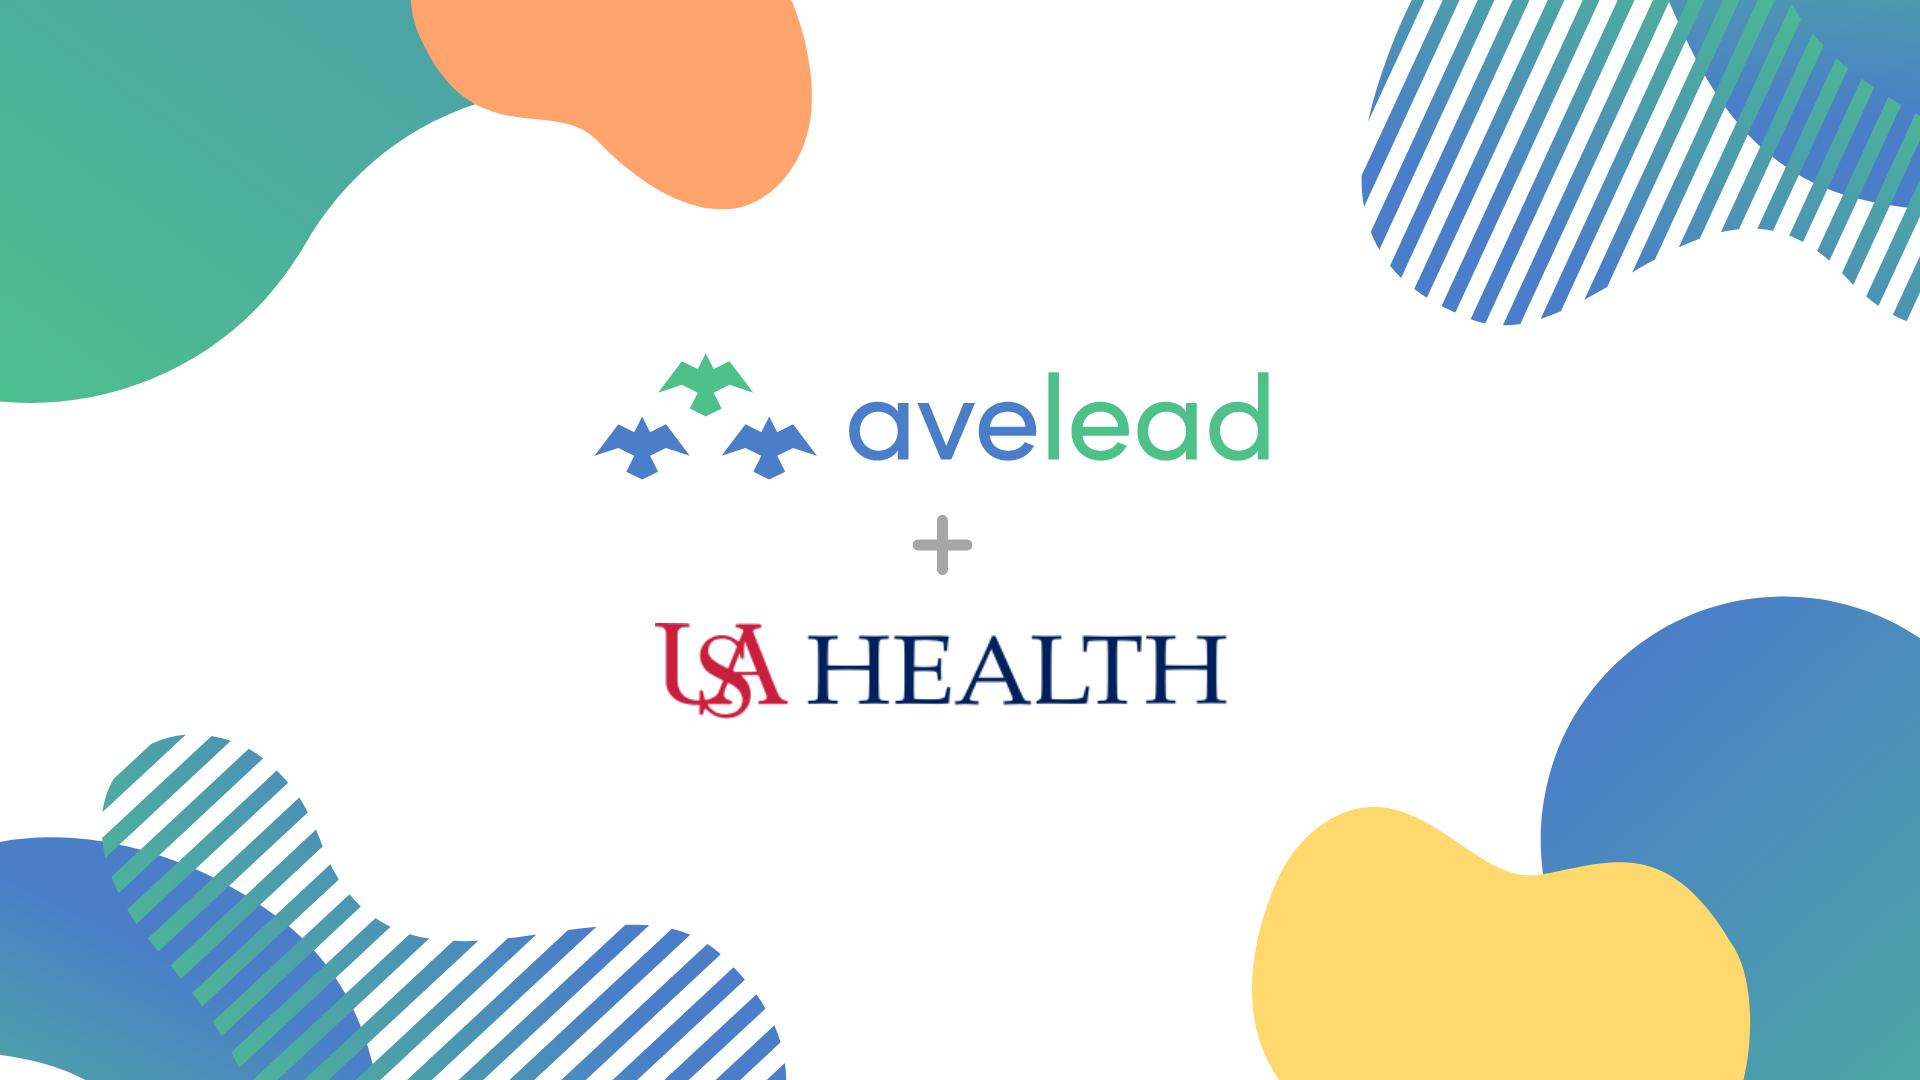 Avelead Logo + USA Health Logo